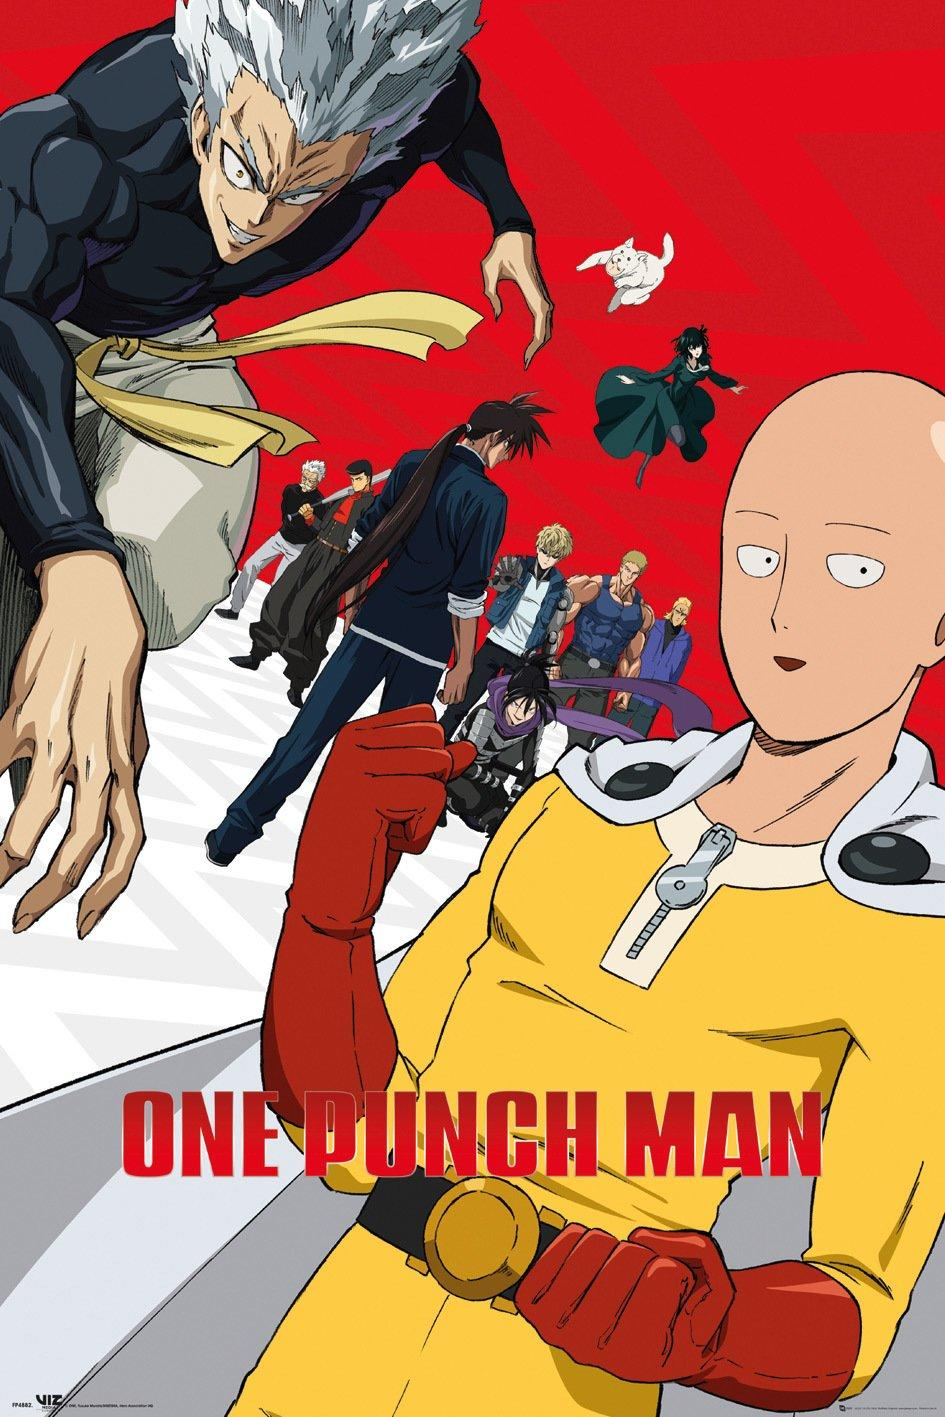 ONE PUNCH MAN - Season 2 - Poster '61x91.5cm'_1